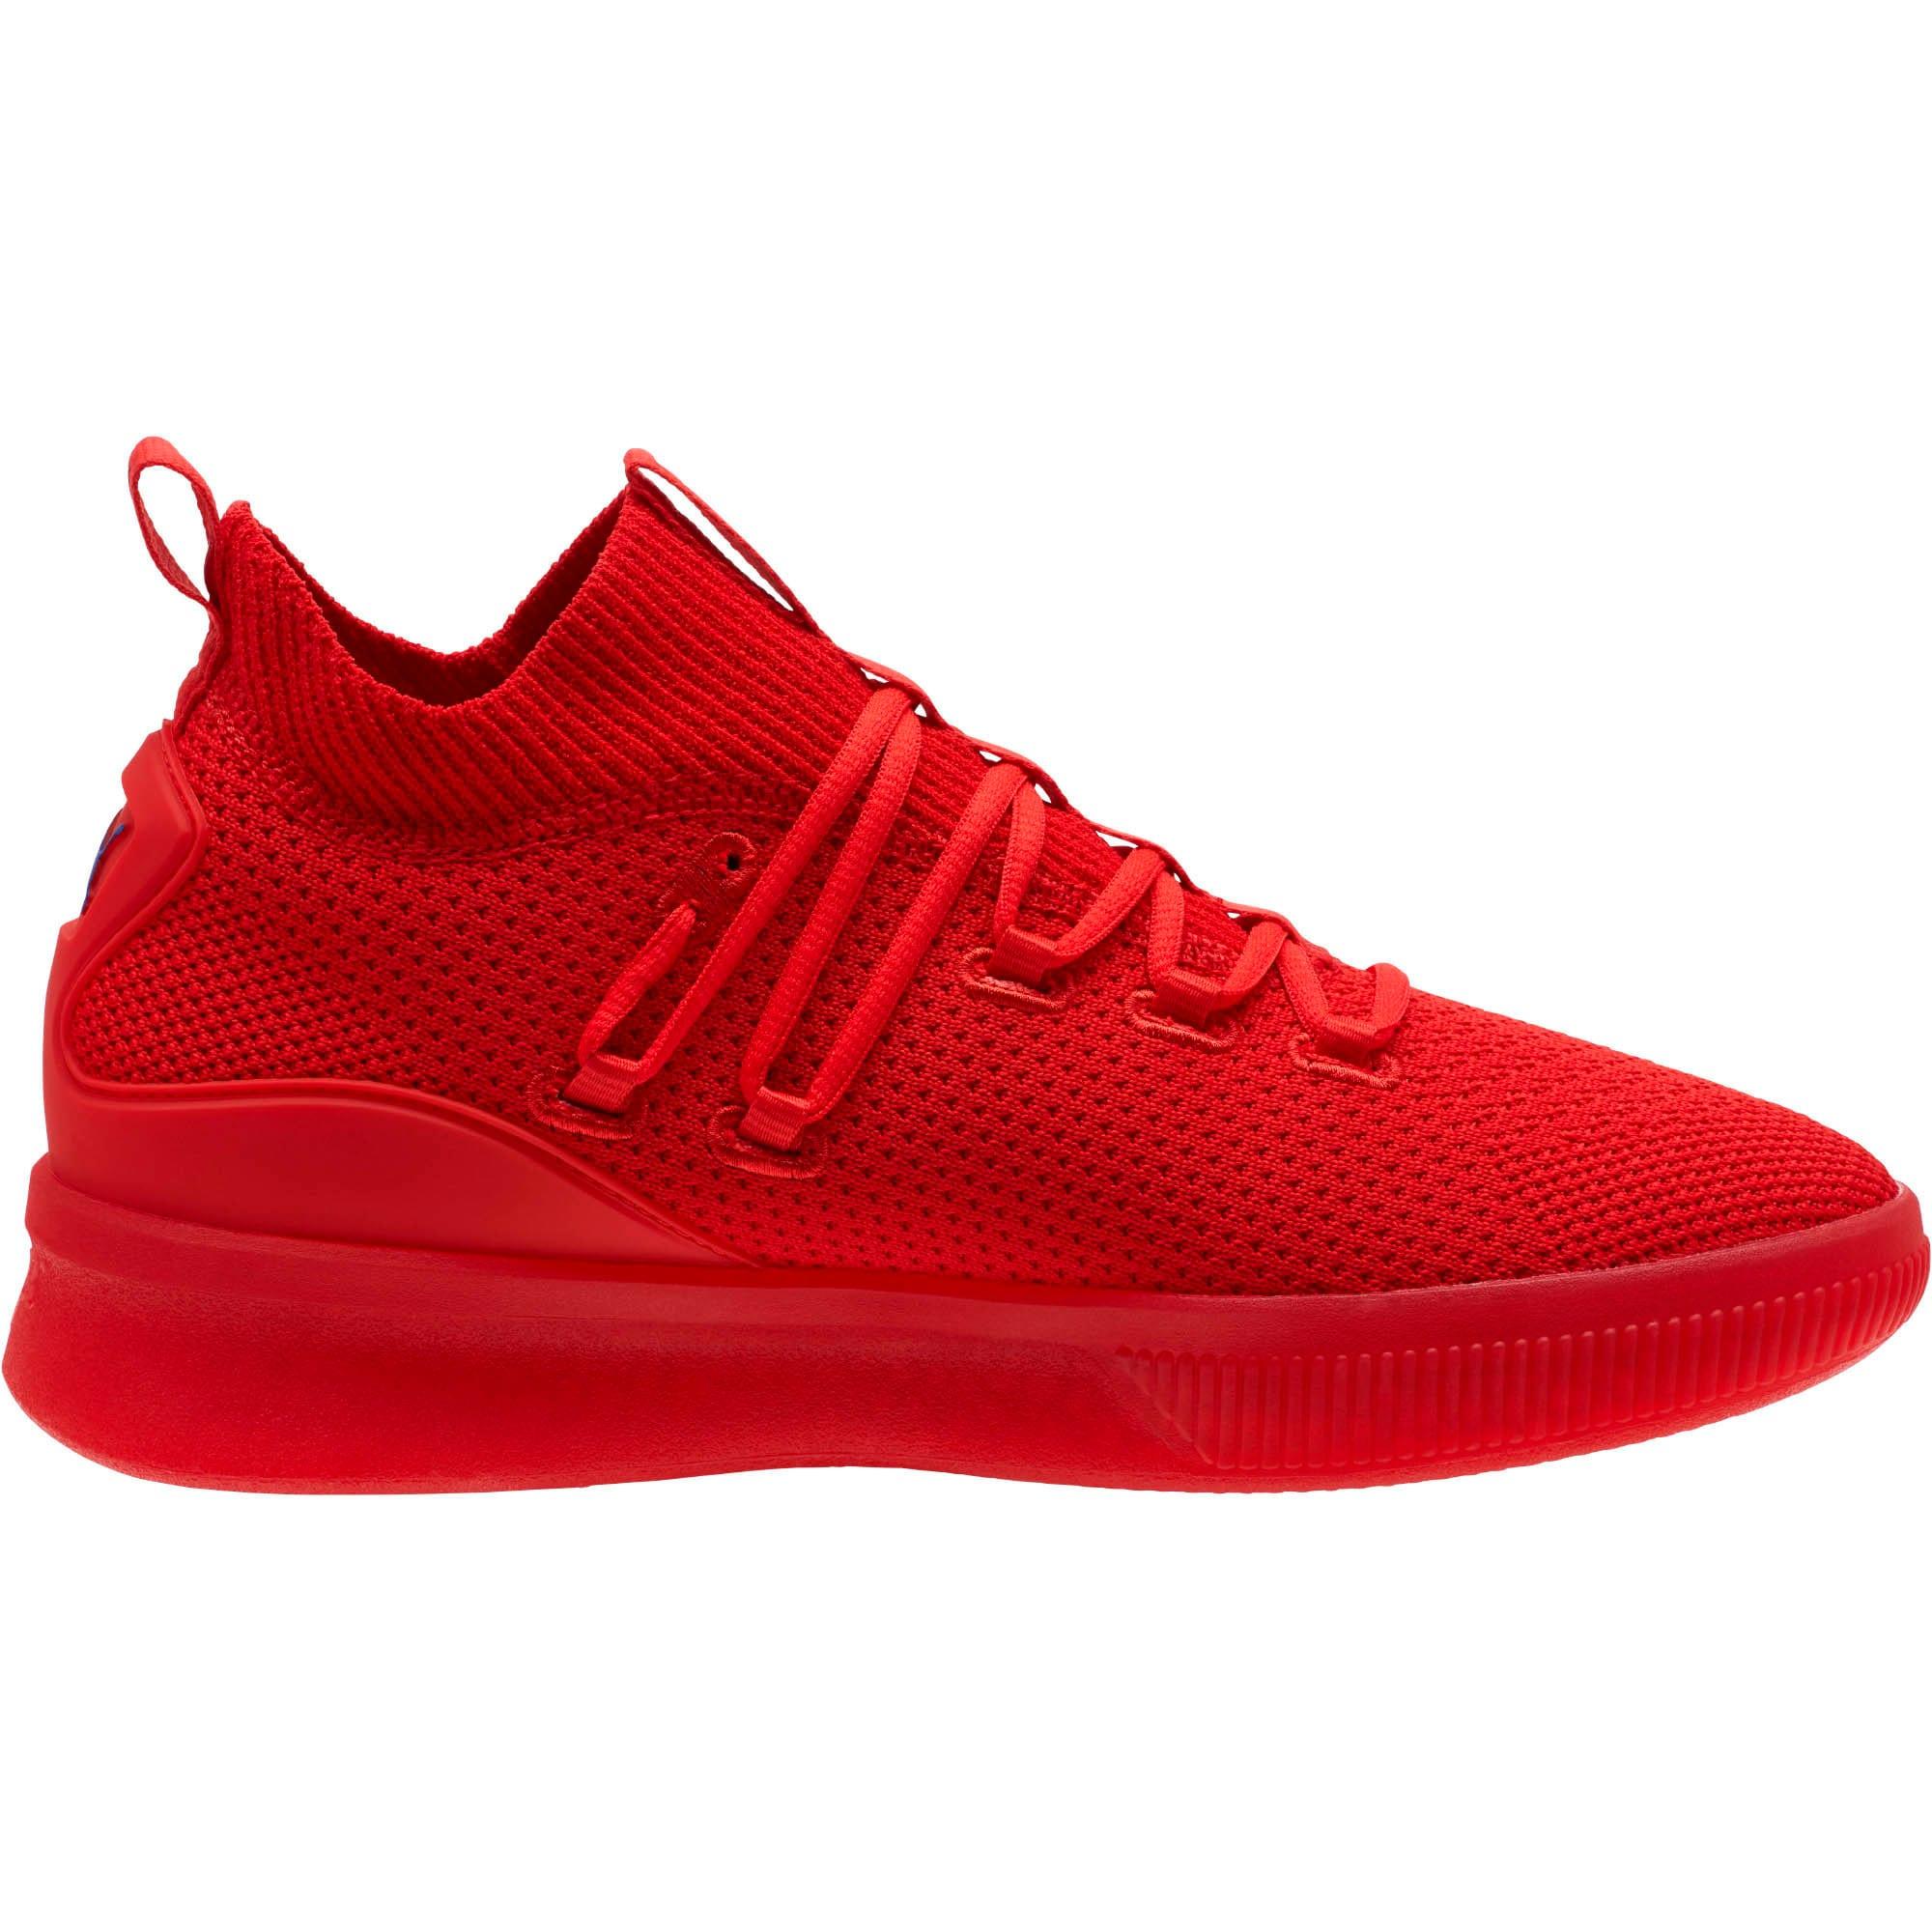 Miniatura 3 de ZapatosClyde Court Core Basketball, High Risk Red-Strong Blue, mediano